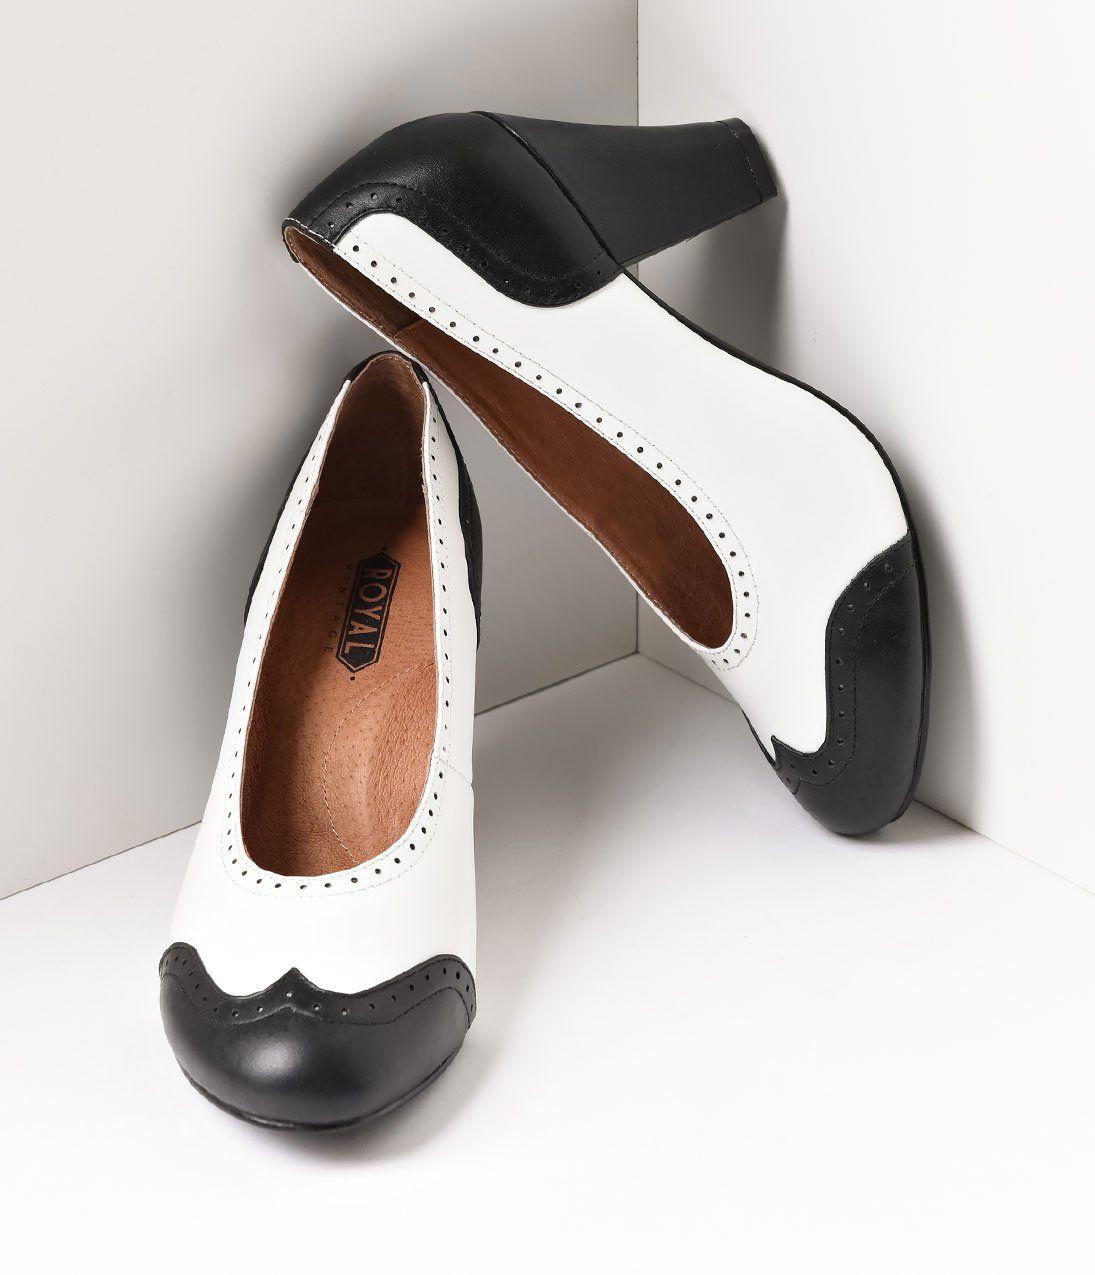 0822ca9a168 Royal Vintage 1940s Style Black & White Spectator Peggy Pumps ...